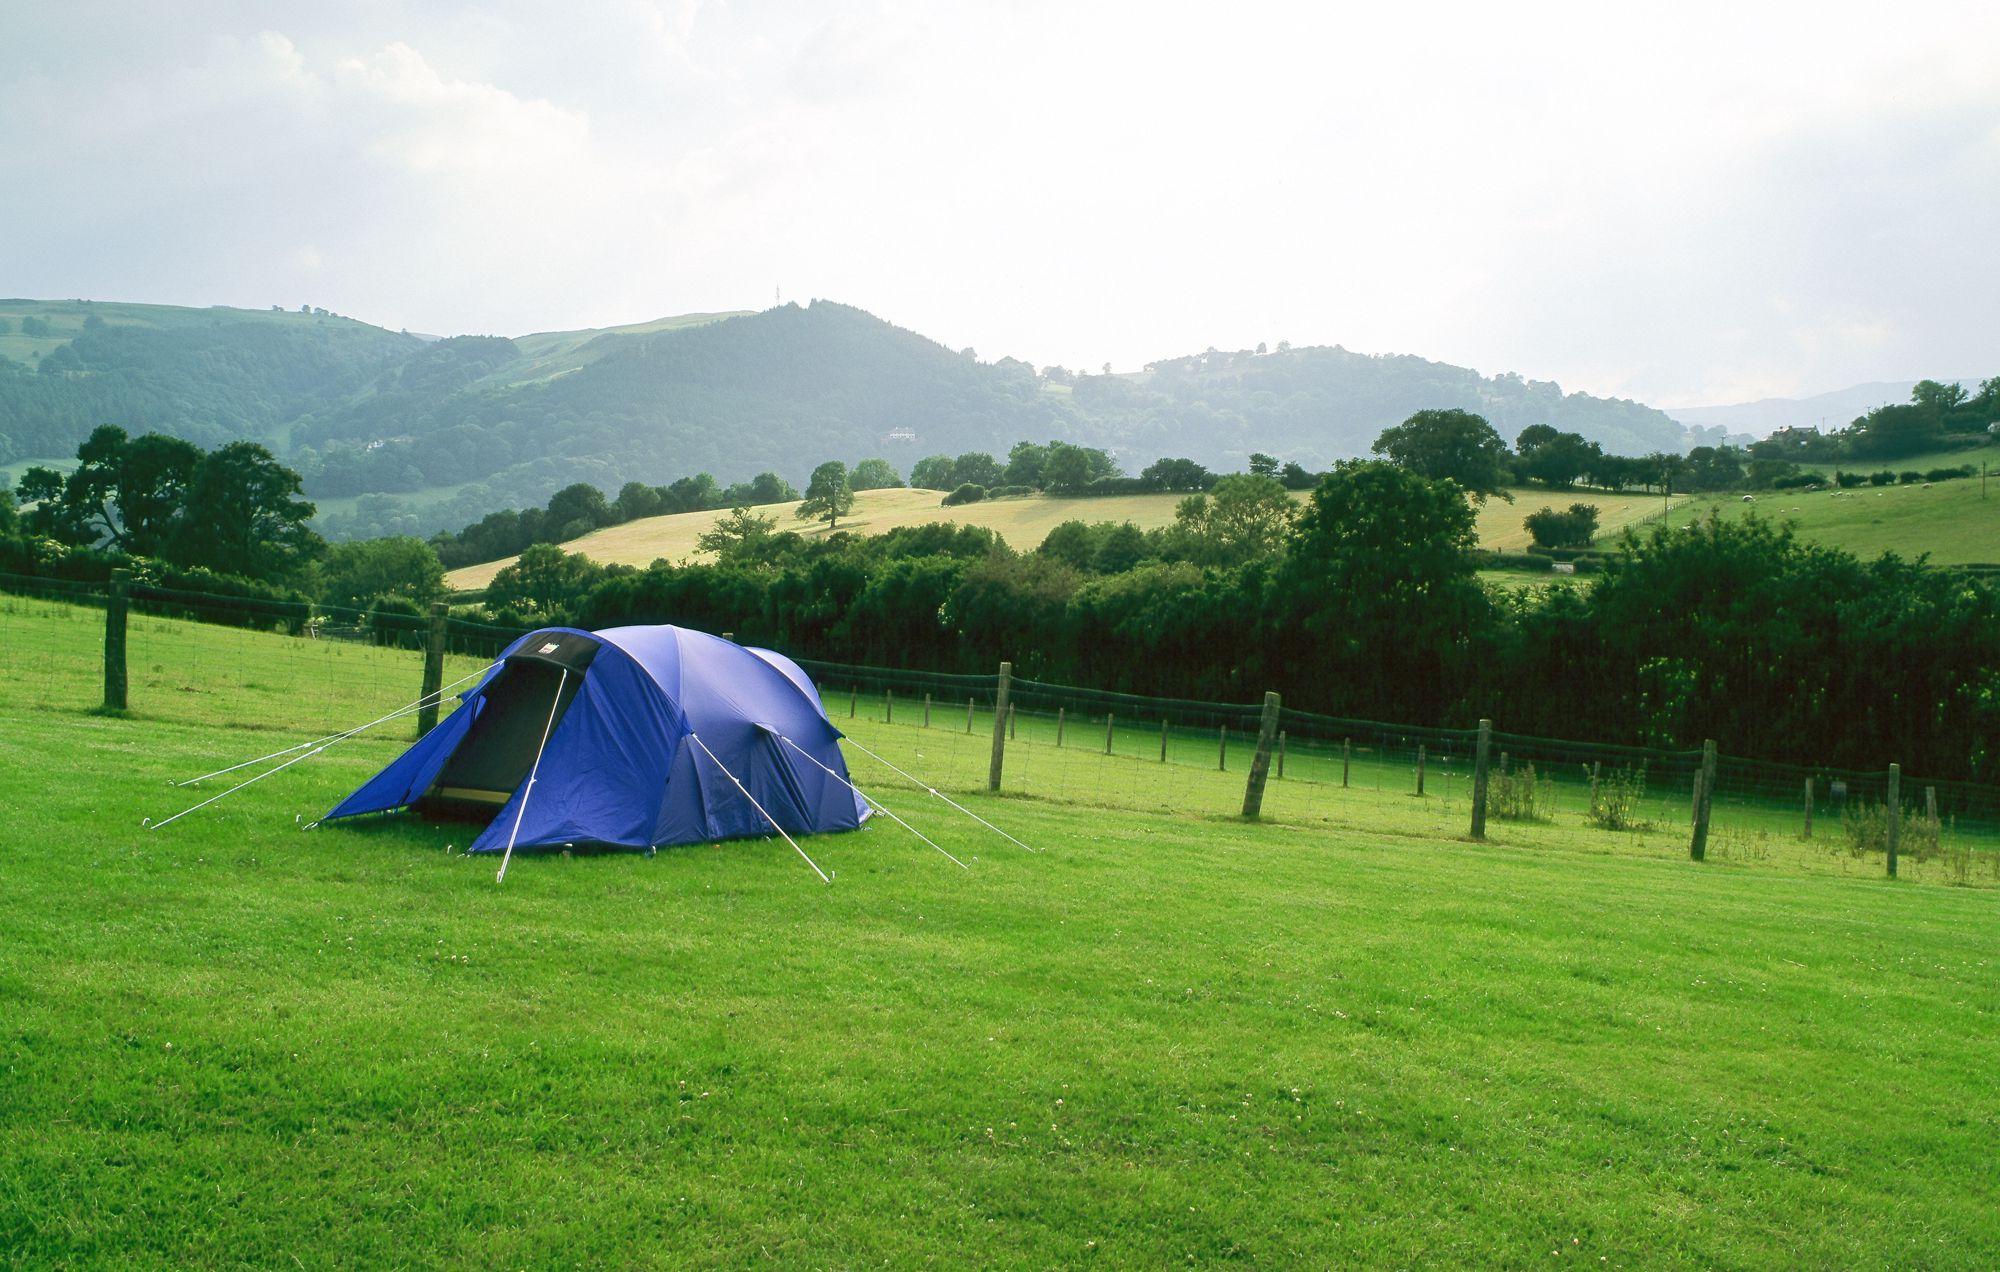 Campsites in Denbighshire